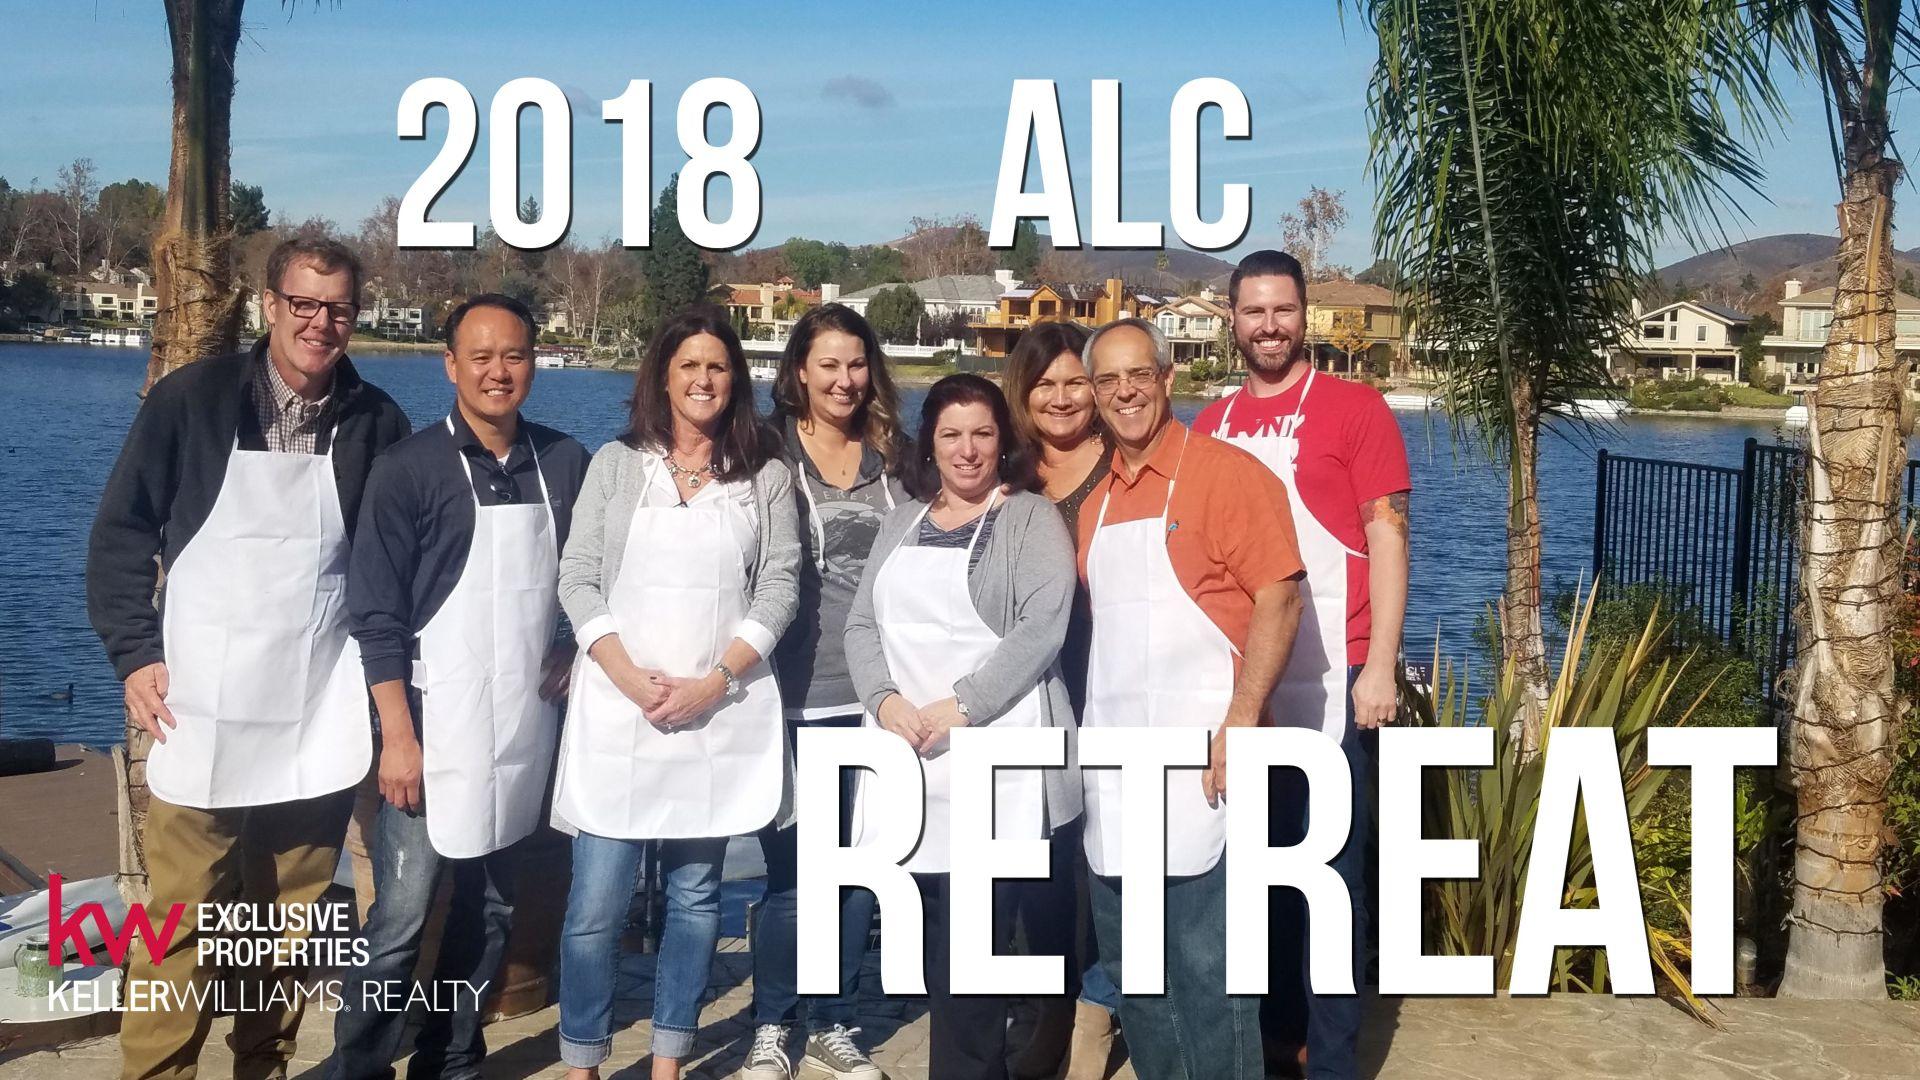 2018 ALC Retreat